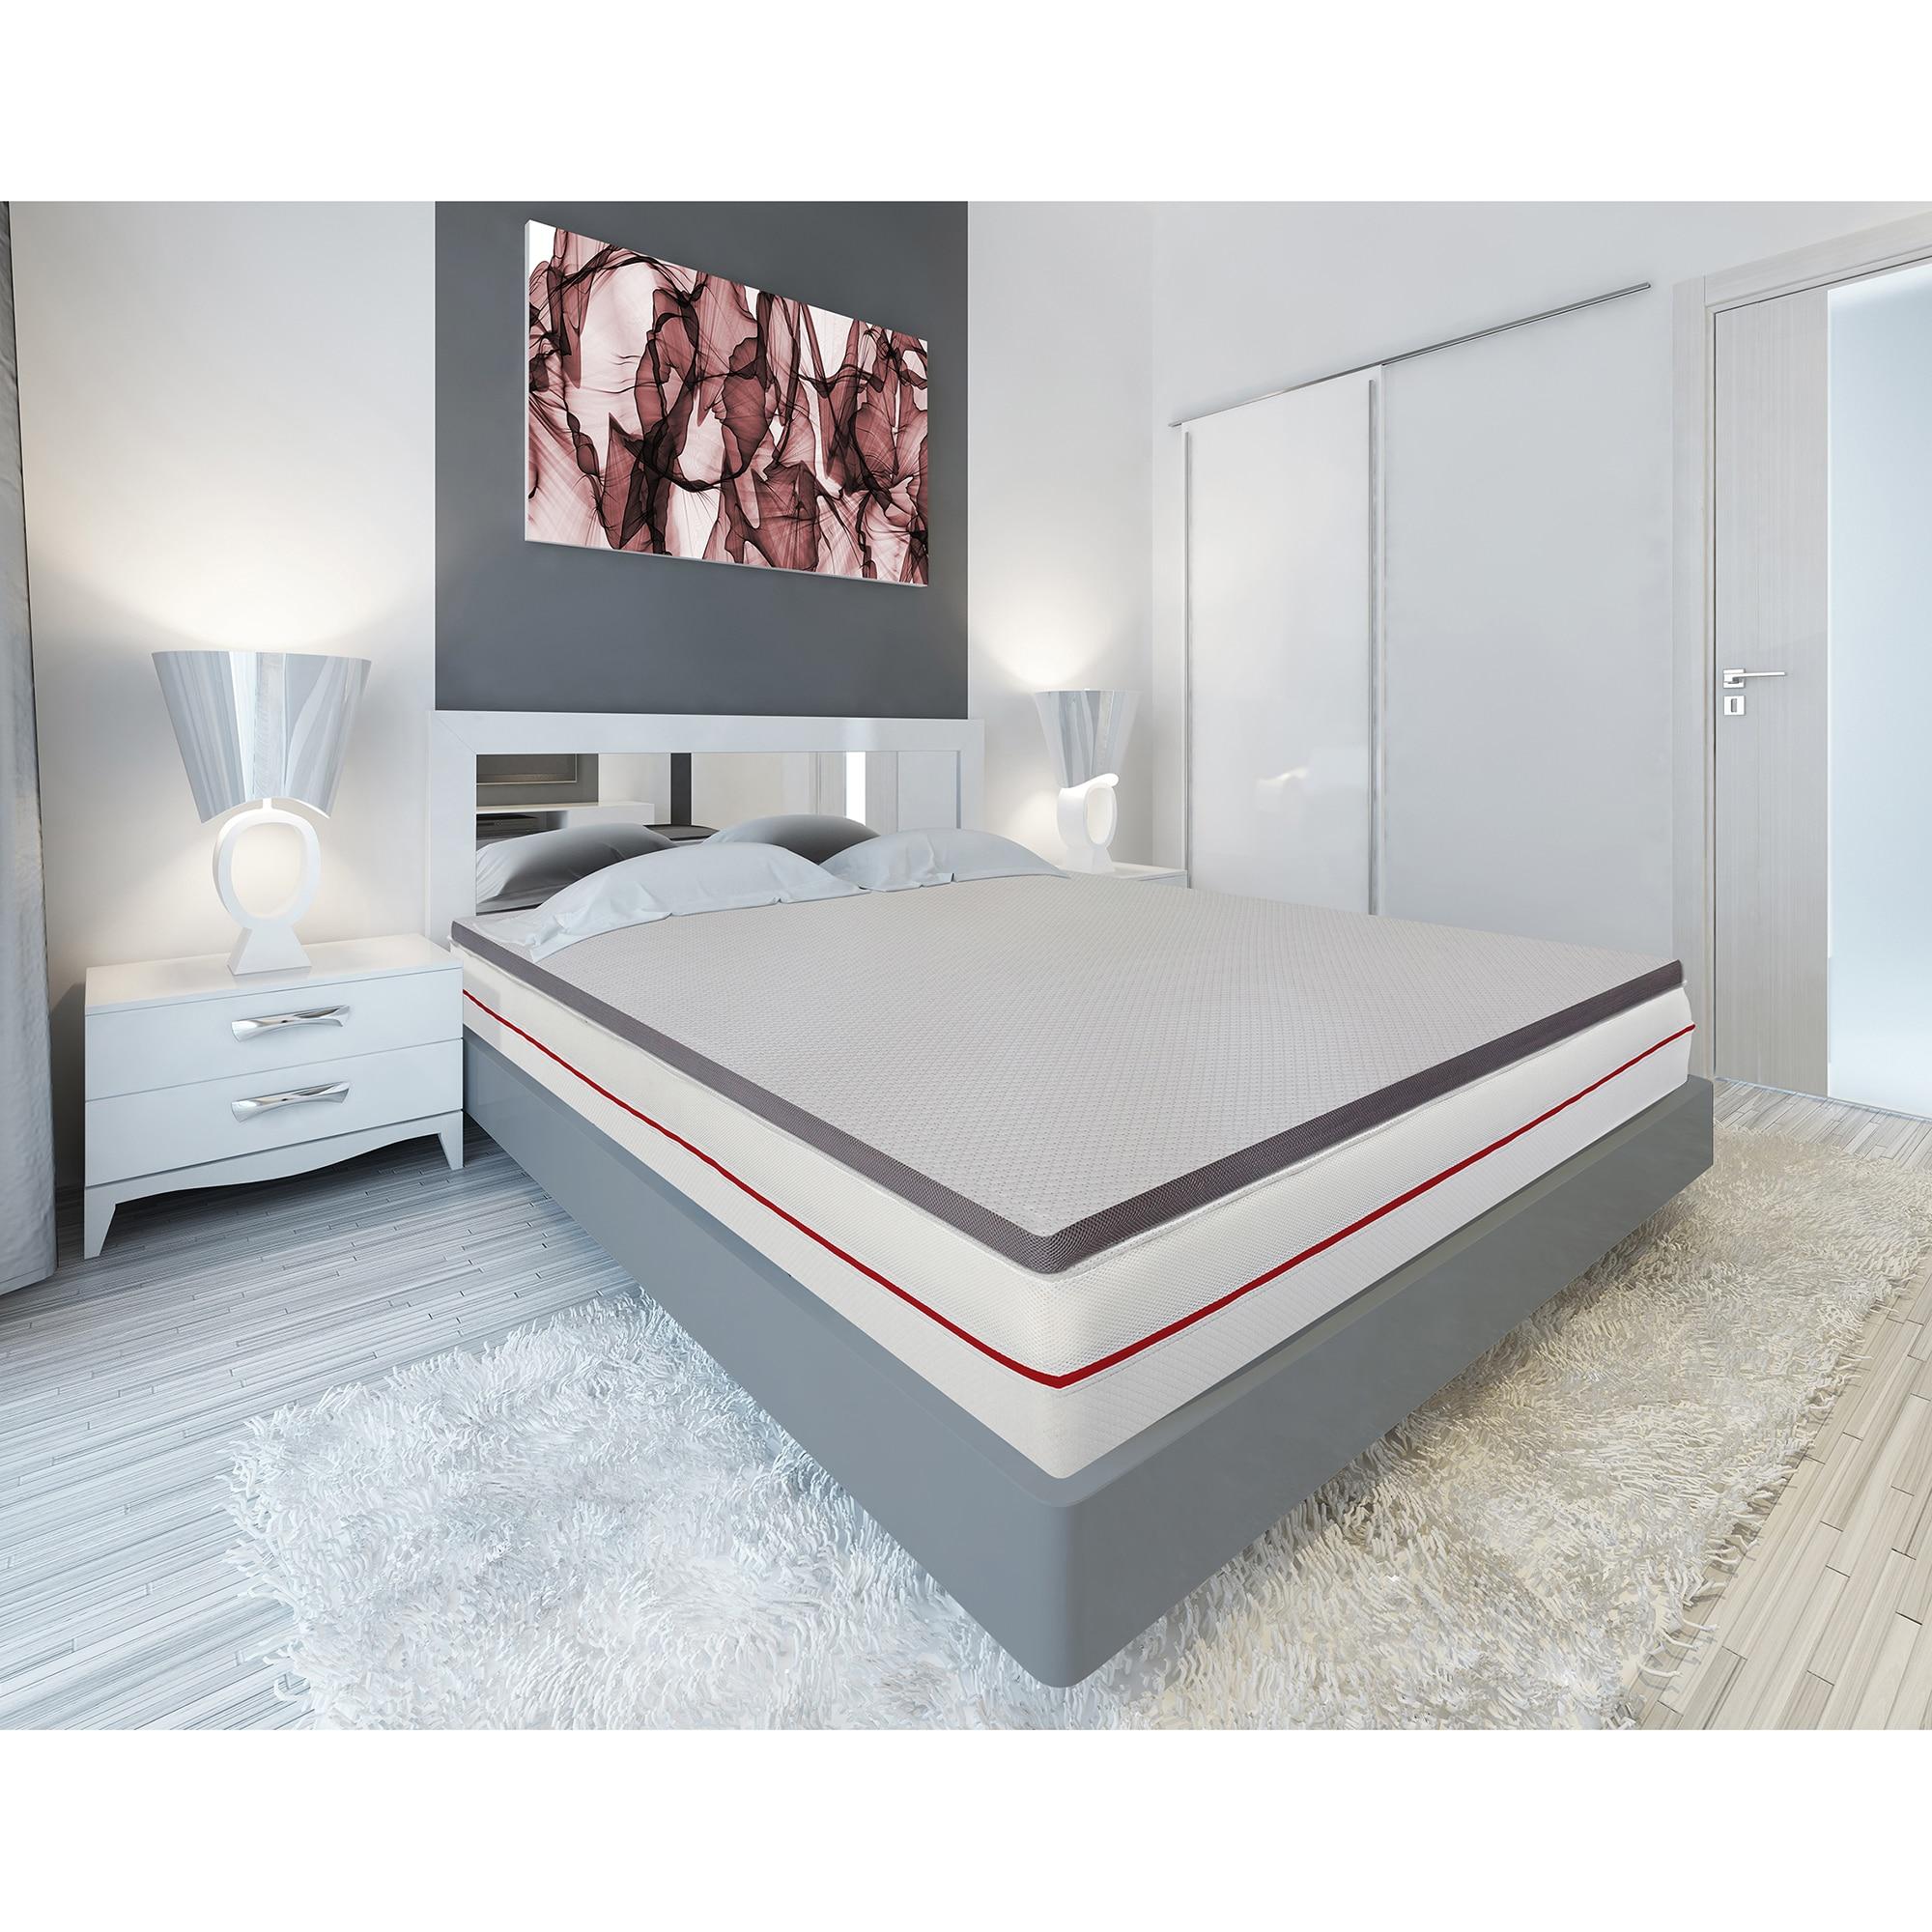 Fotografie Topper saltea Kring Luxury, H 8 cm spuma memory, 140x190 cm